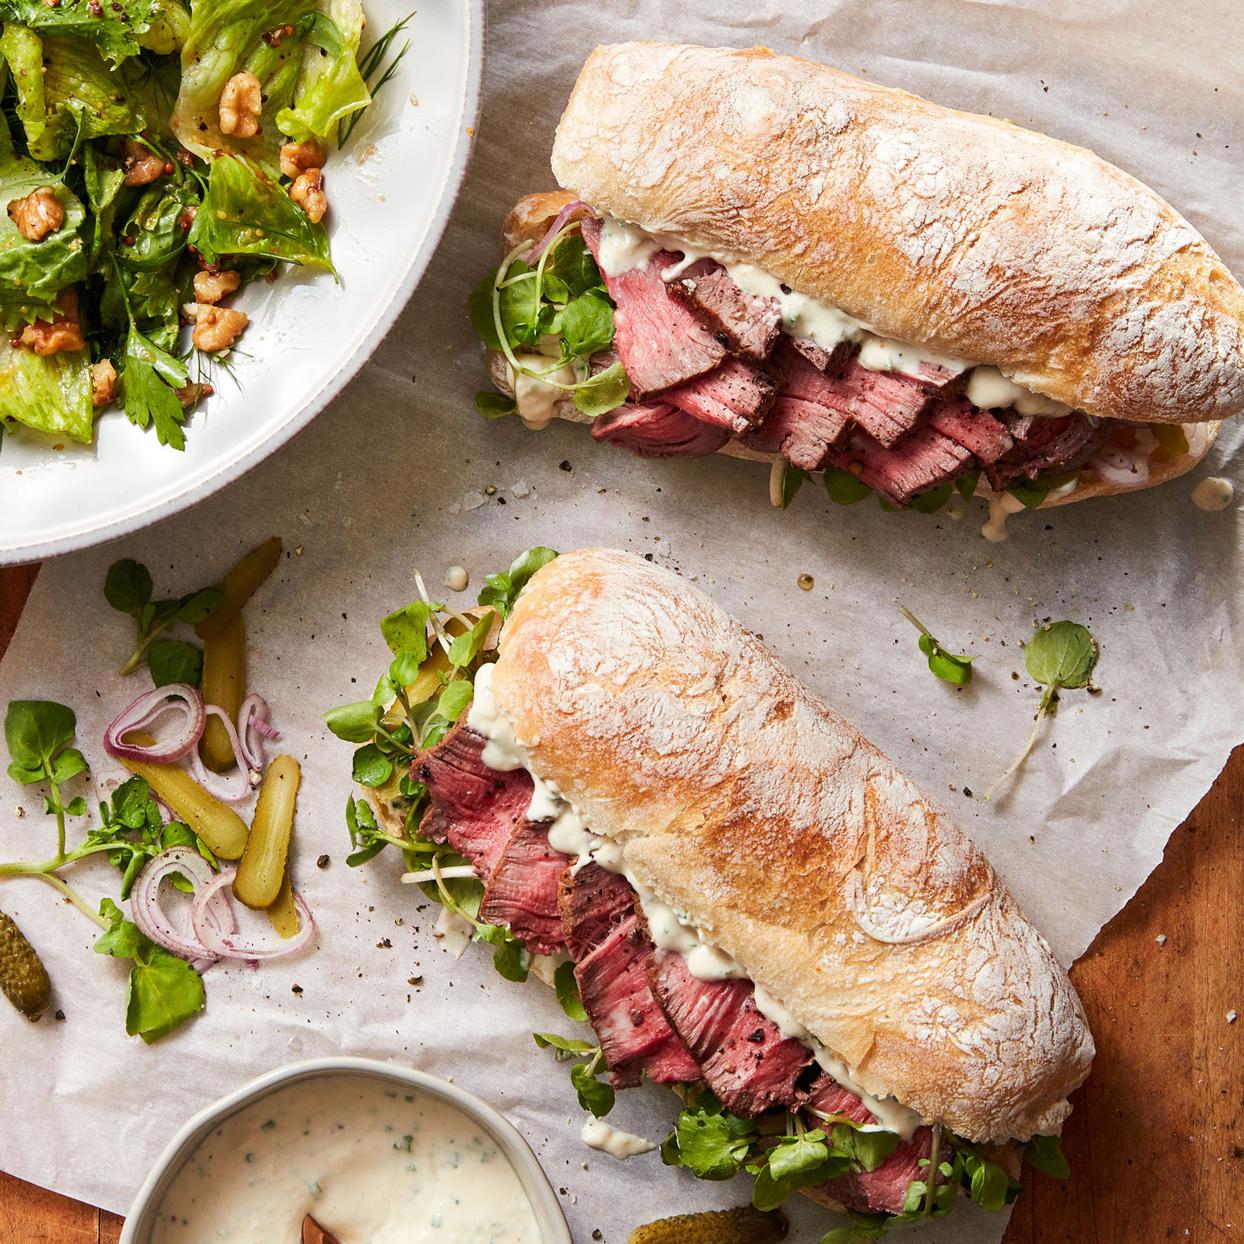 petite filet sandwiches with horseradish-dijon sauce